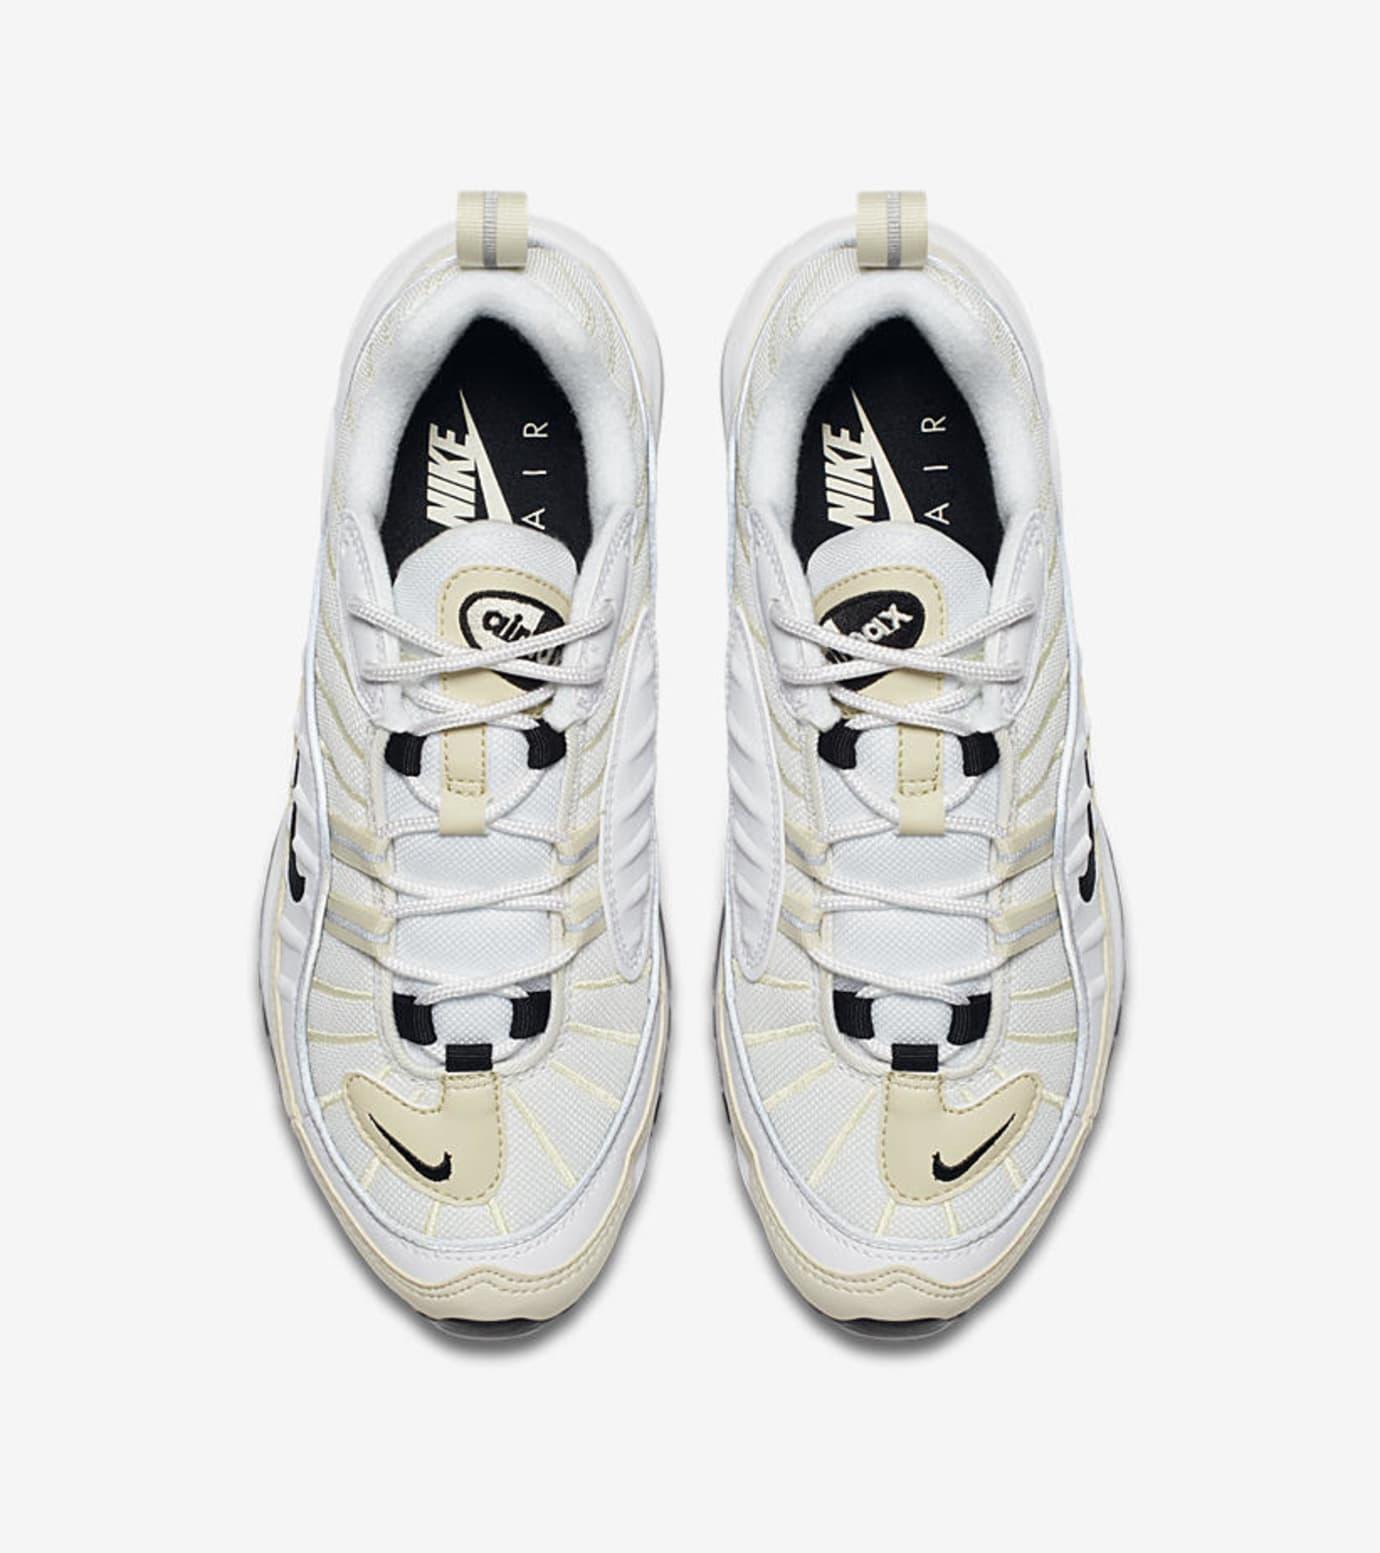 super popular 81773 84c51 WMNS Nike Air Max 98 White/Black/Fossil AH6799-102 Release ...